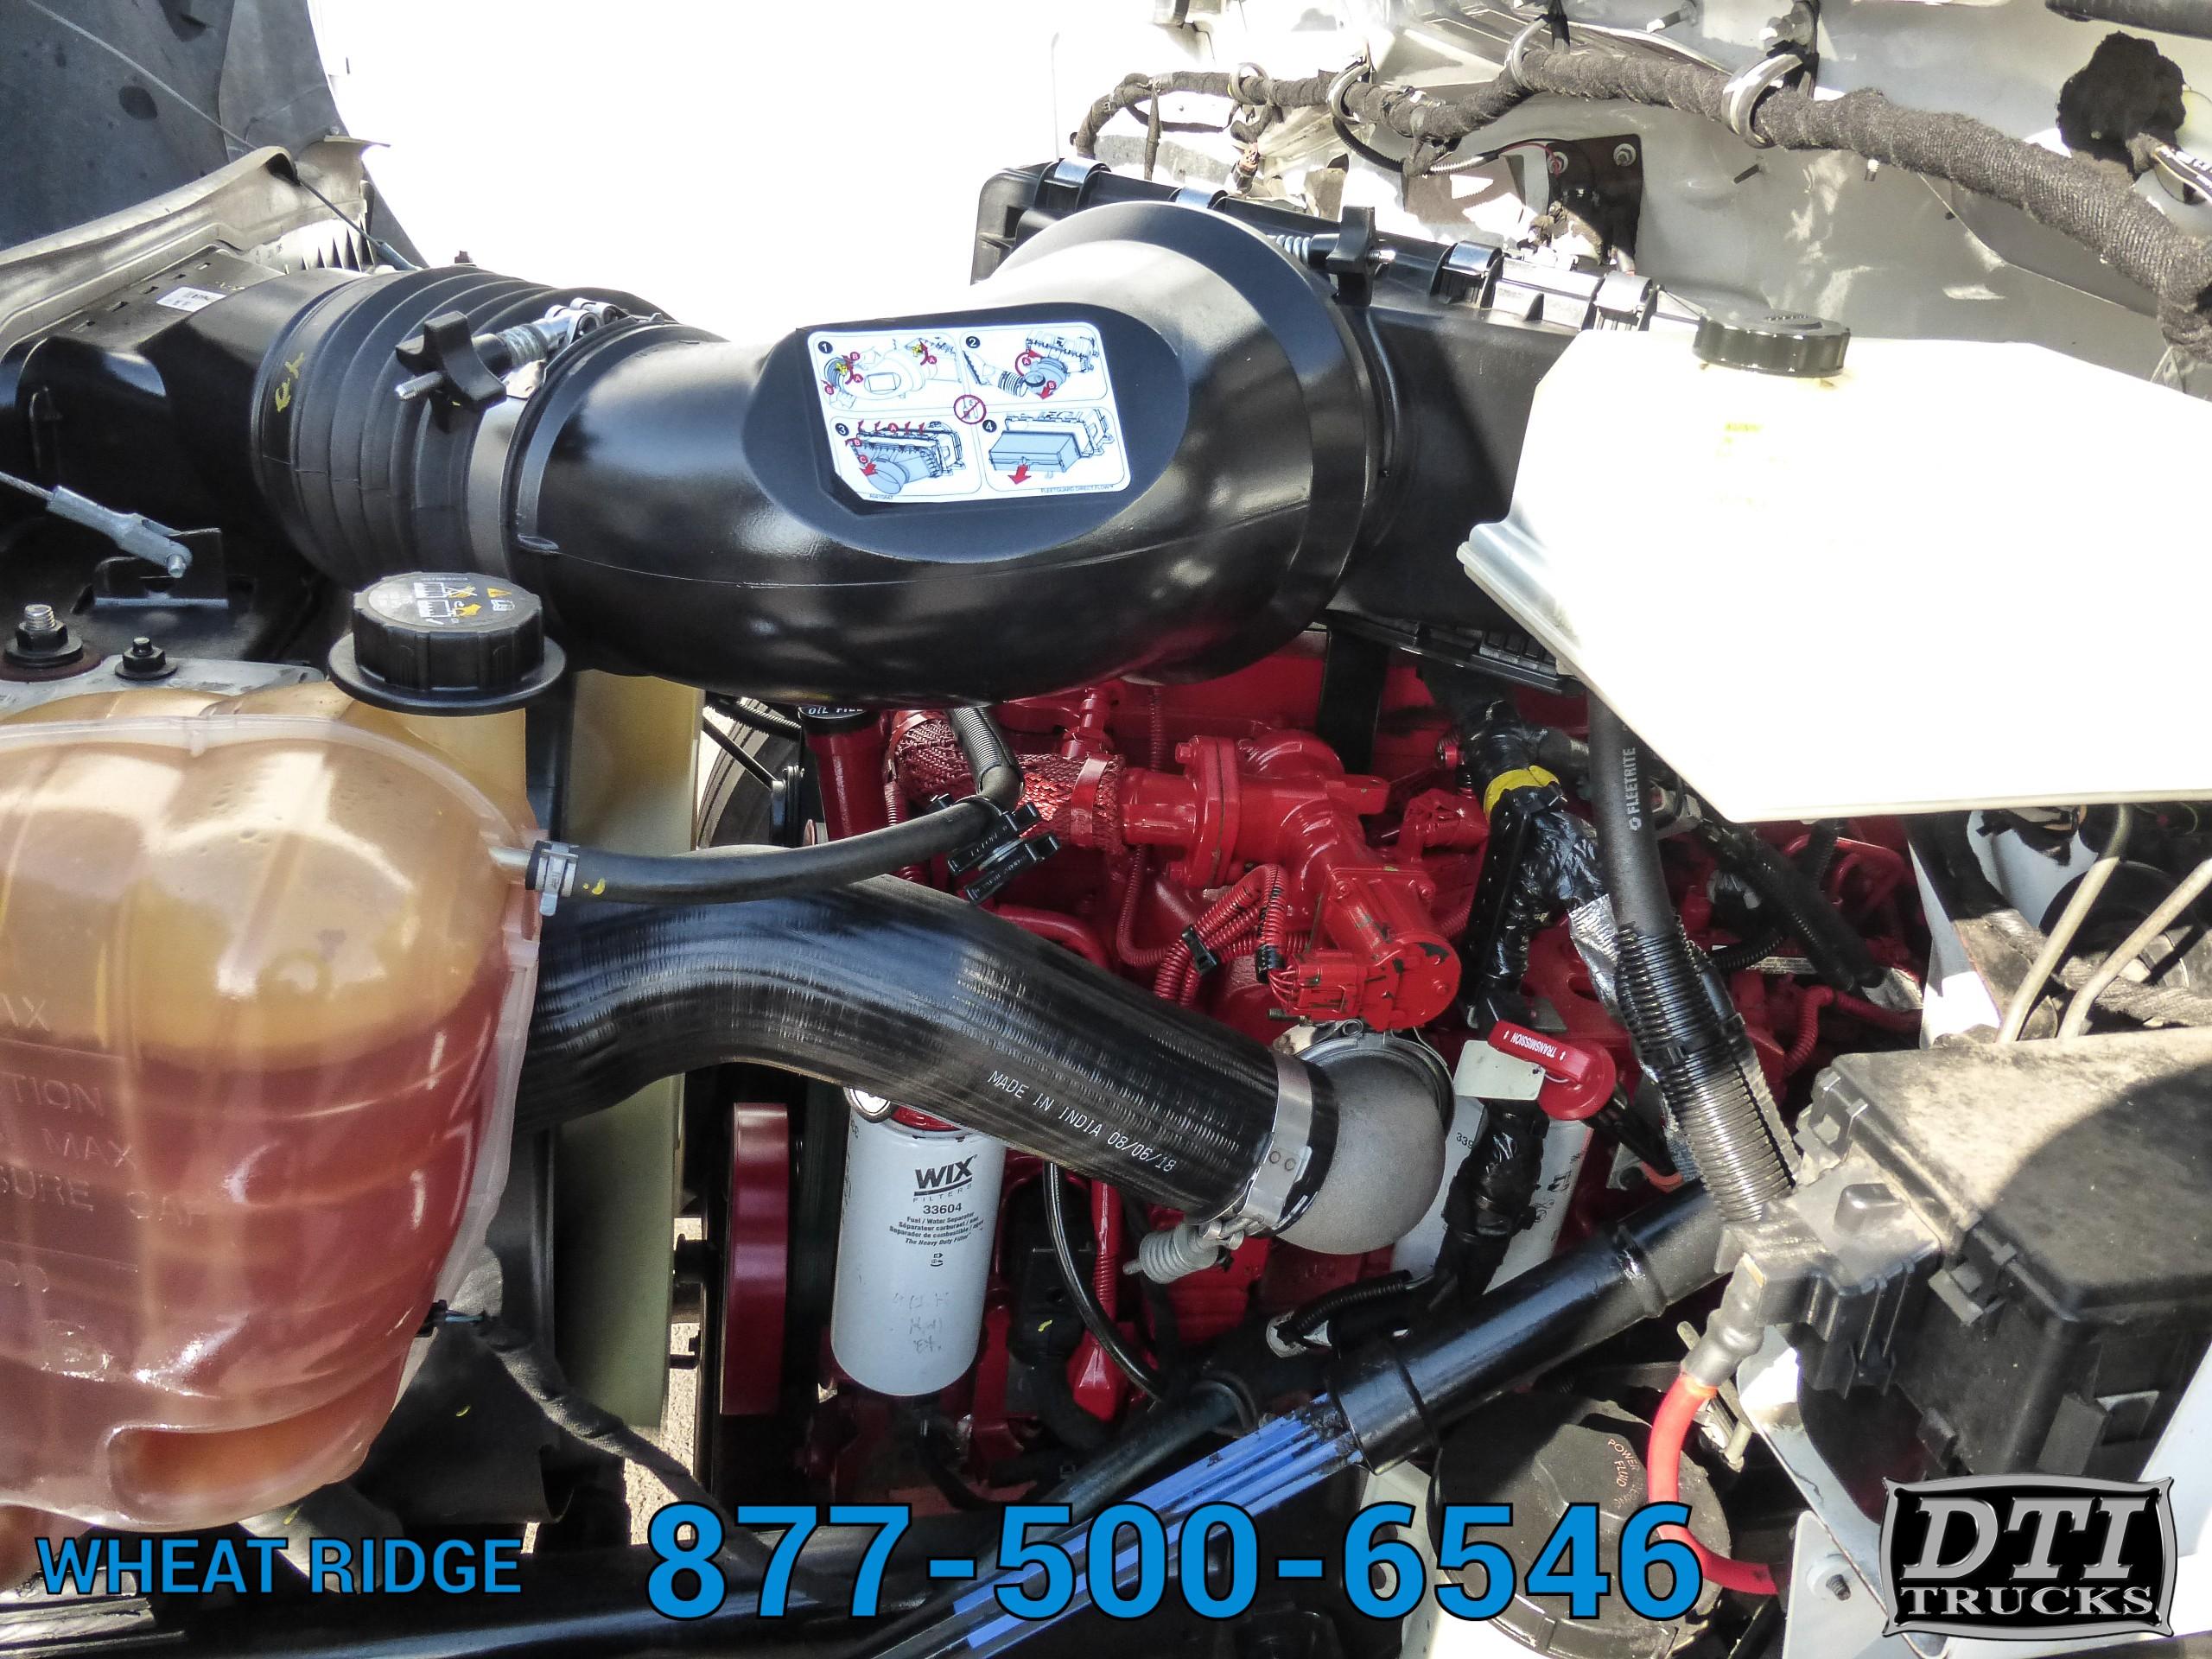 Used 2012 Ford F650 in Wheat Ridge, CODTI Trucks